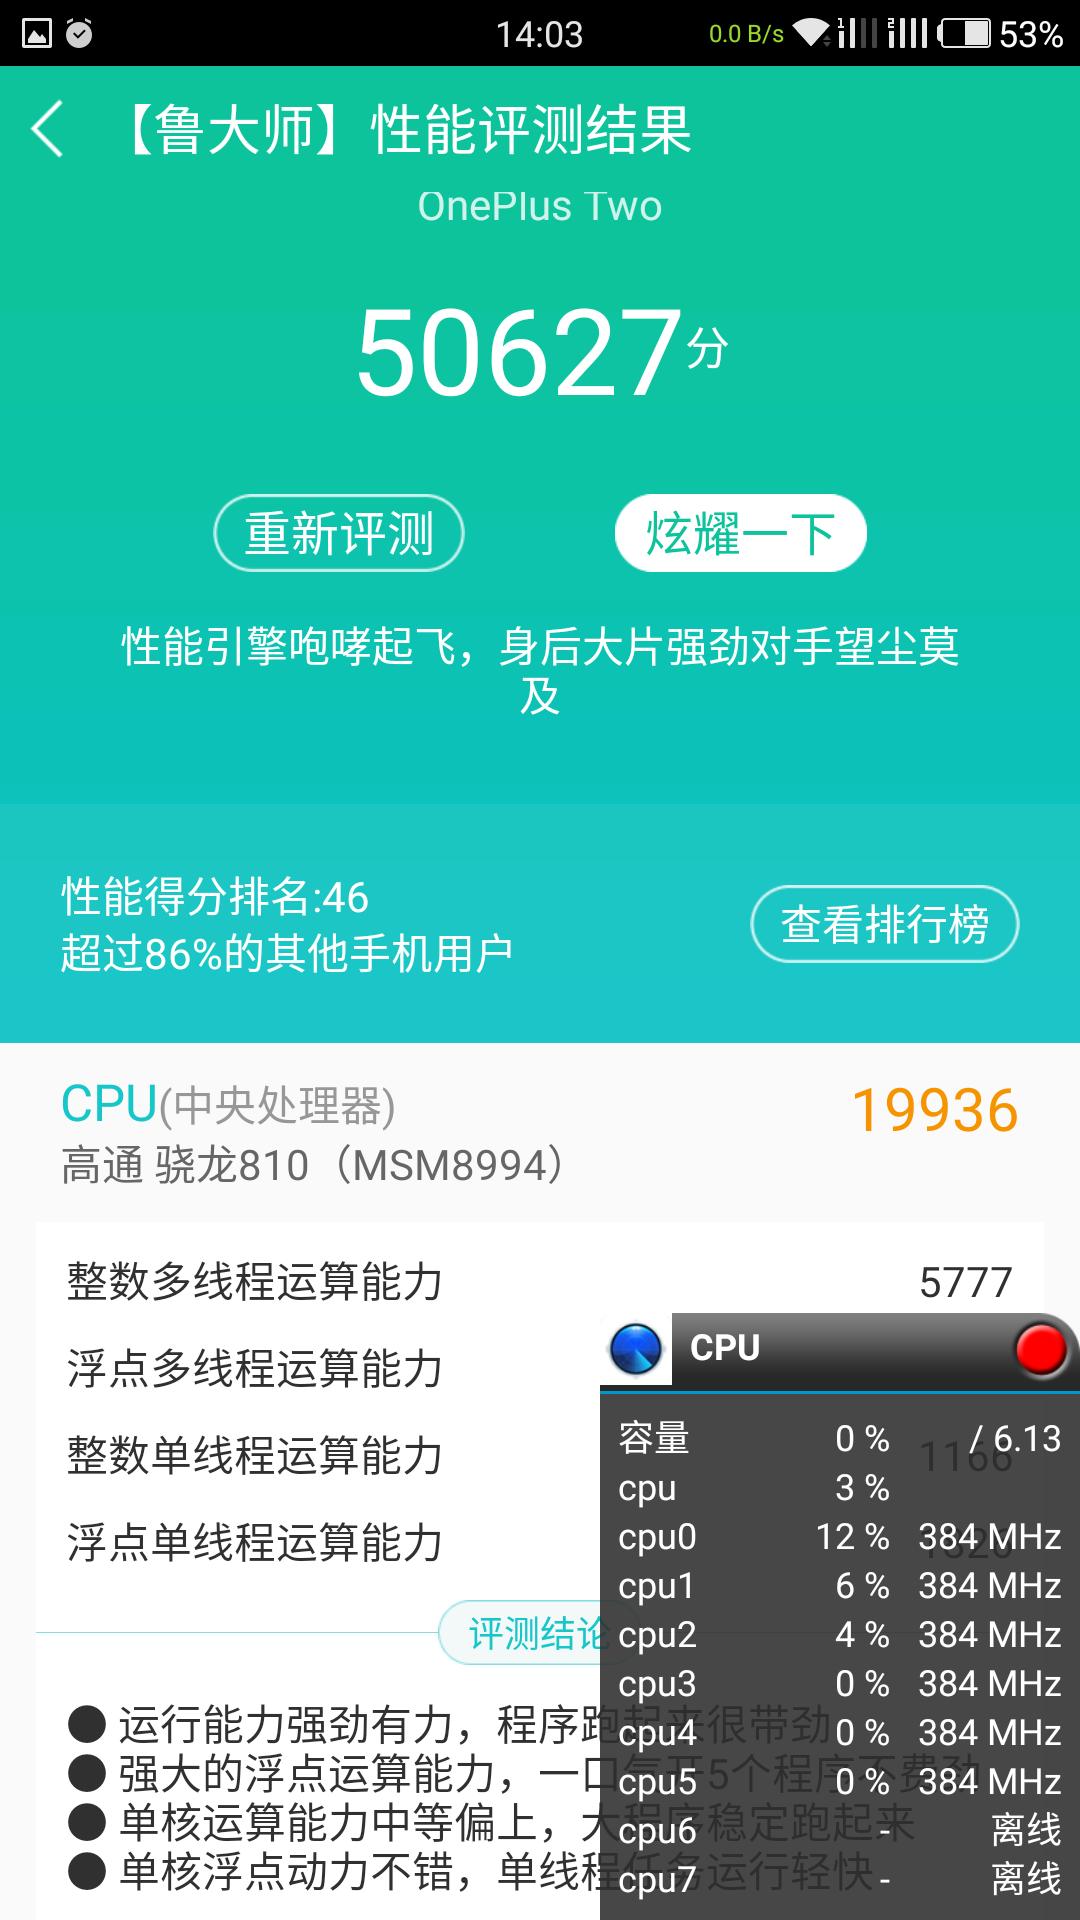 Screenshot_20160703-140318.png